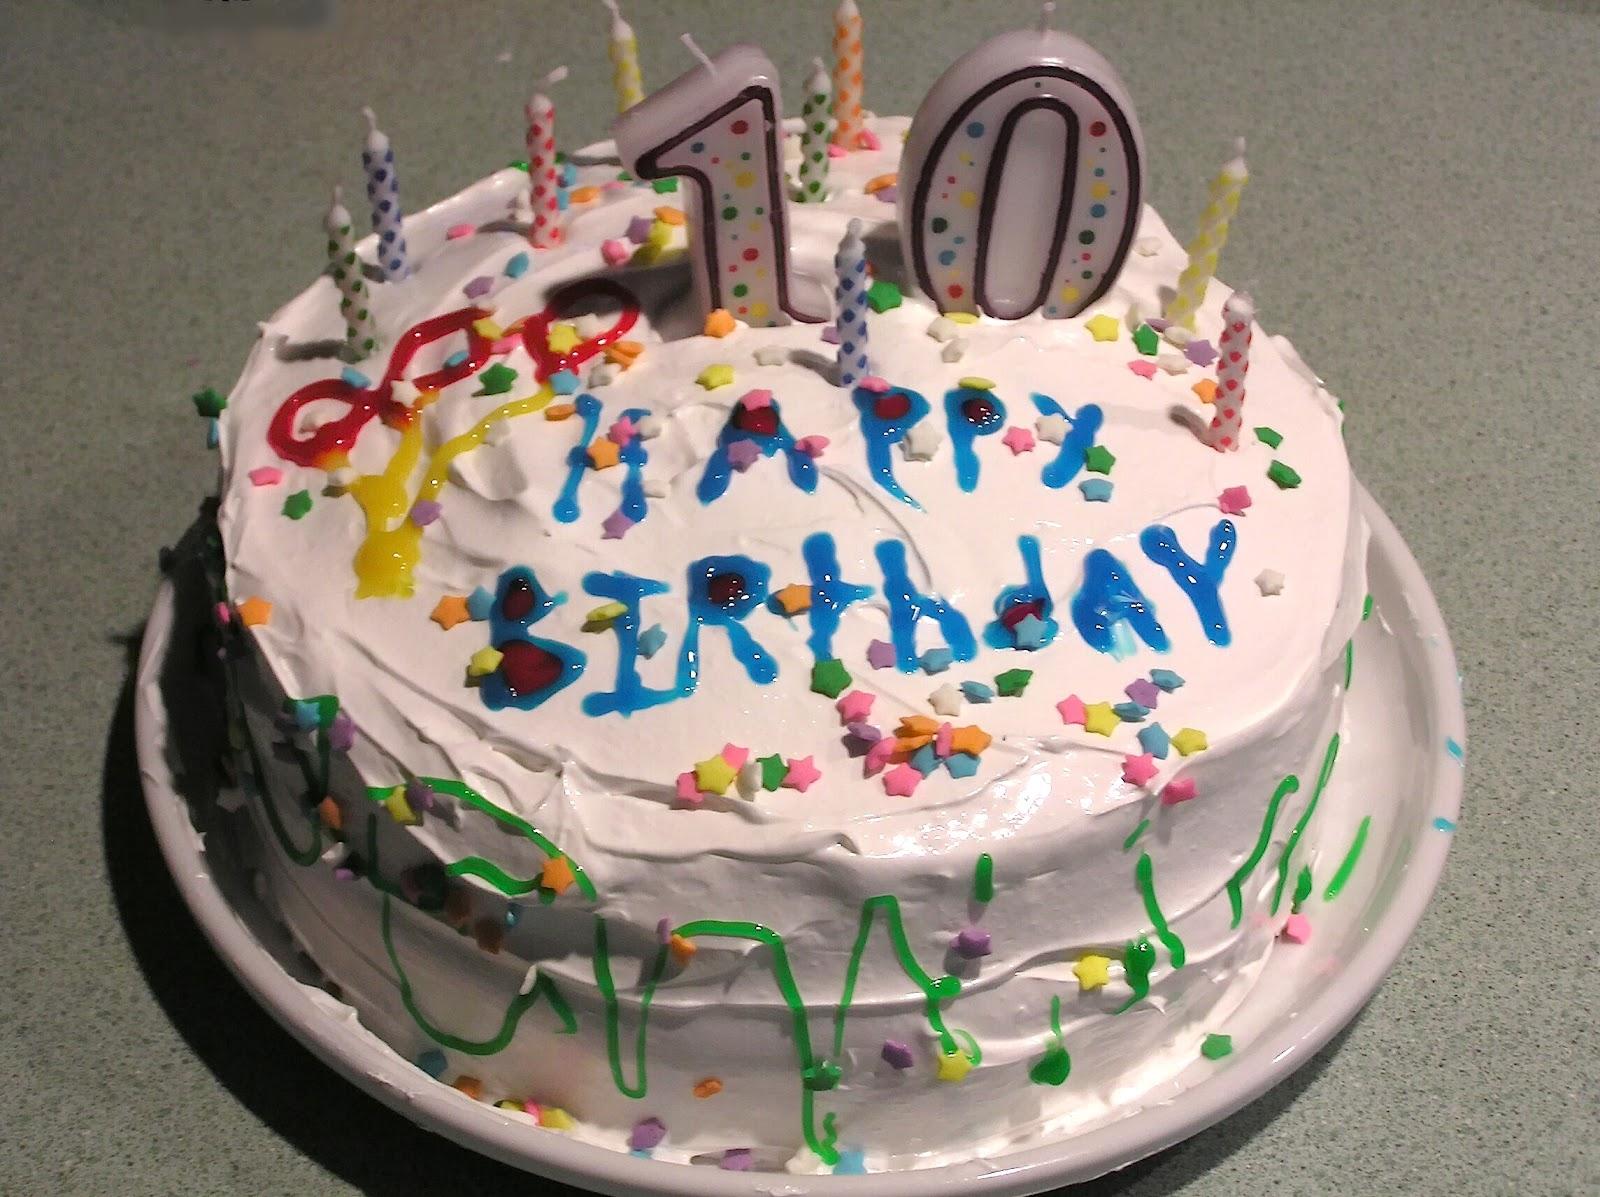 Birthday_cake-01.jpg